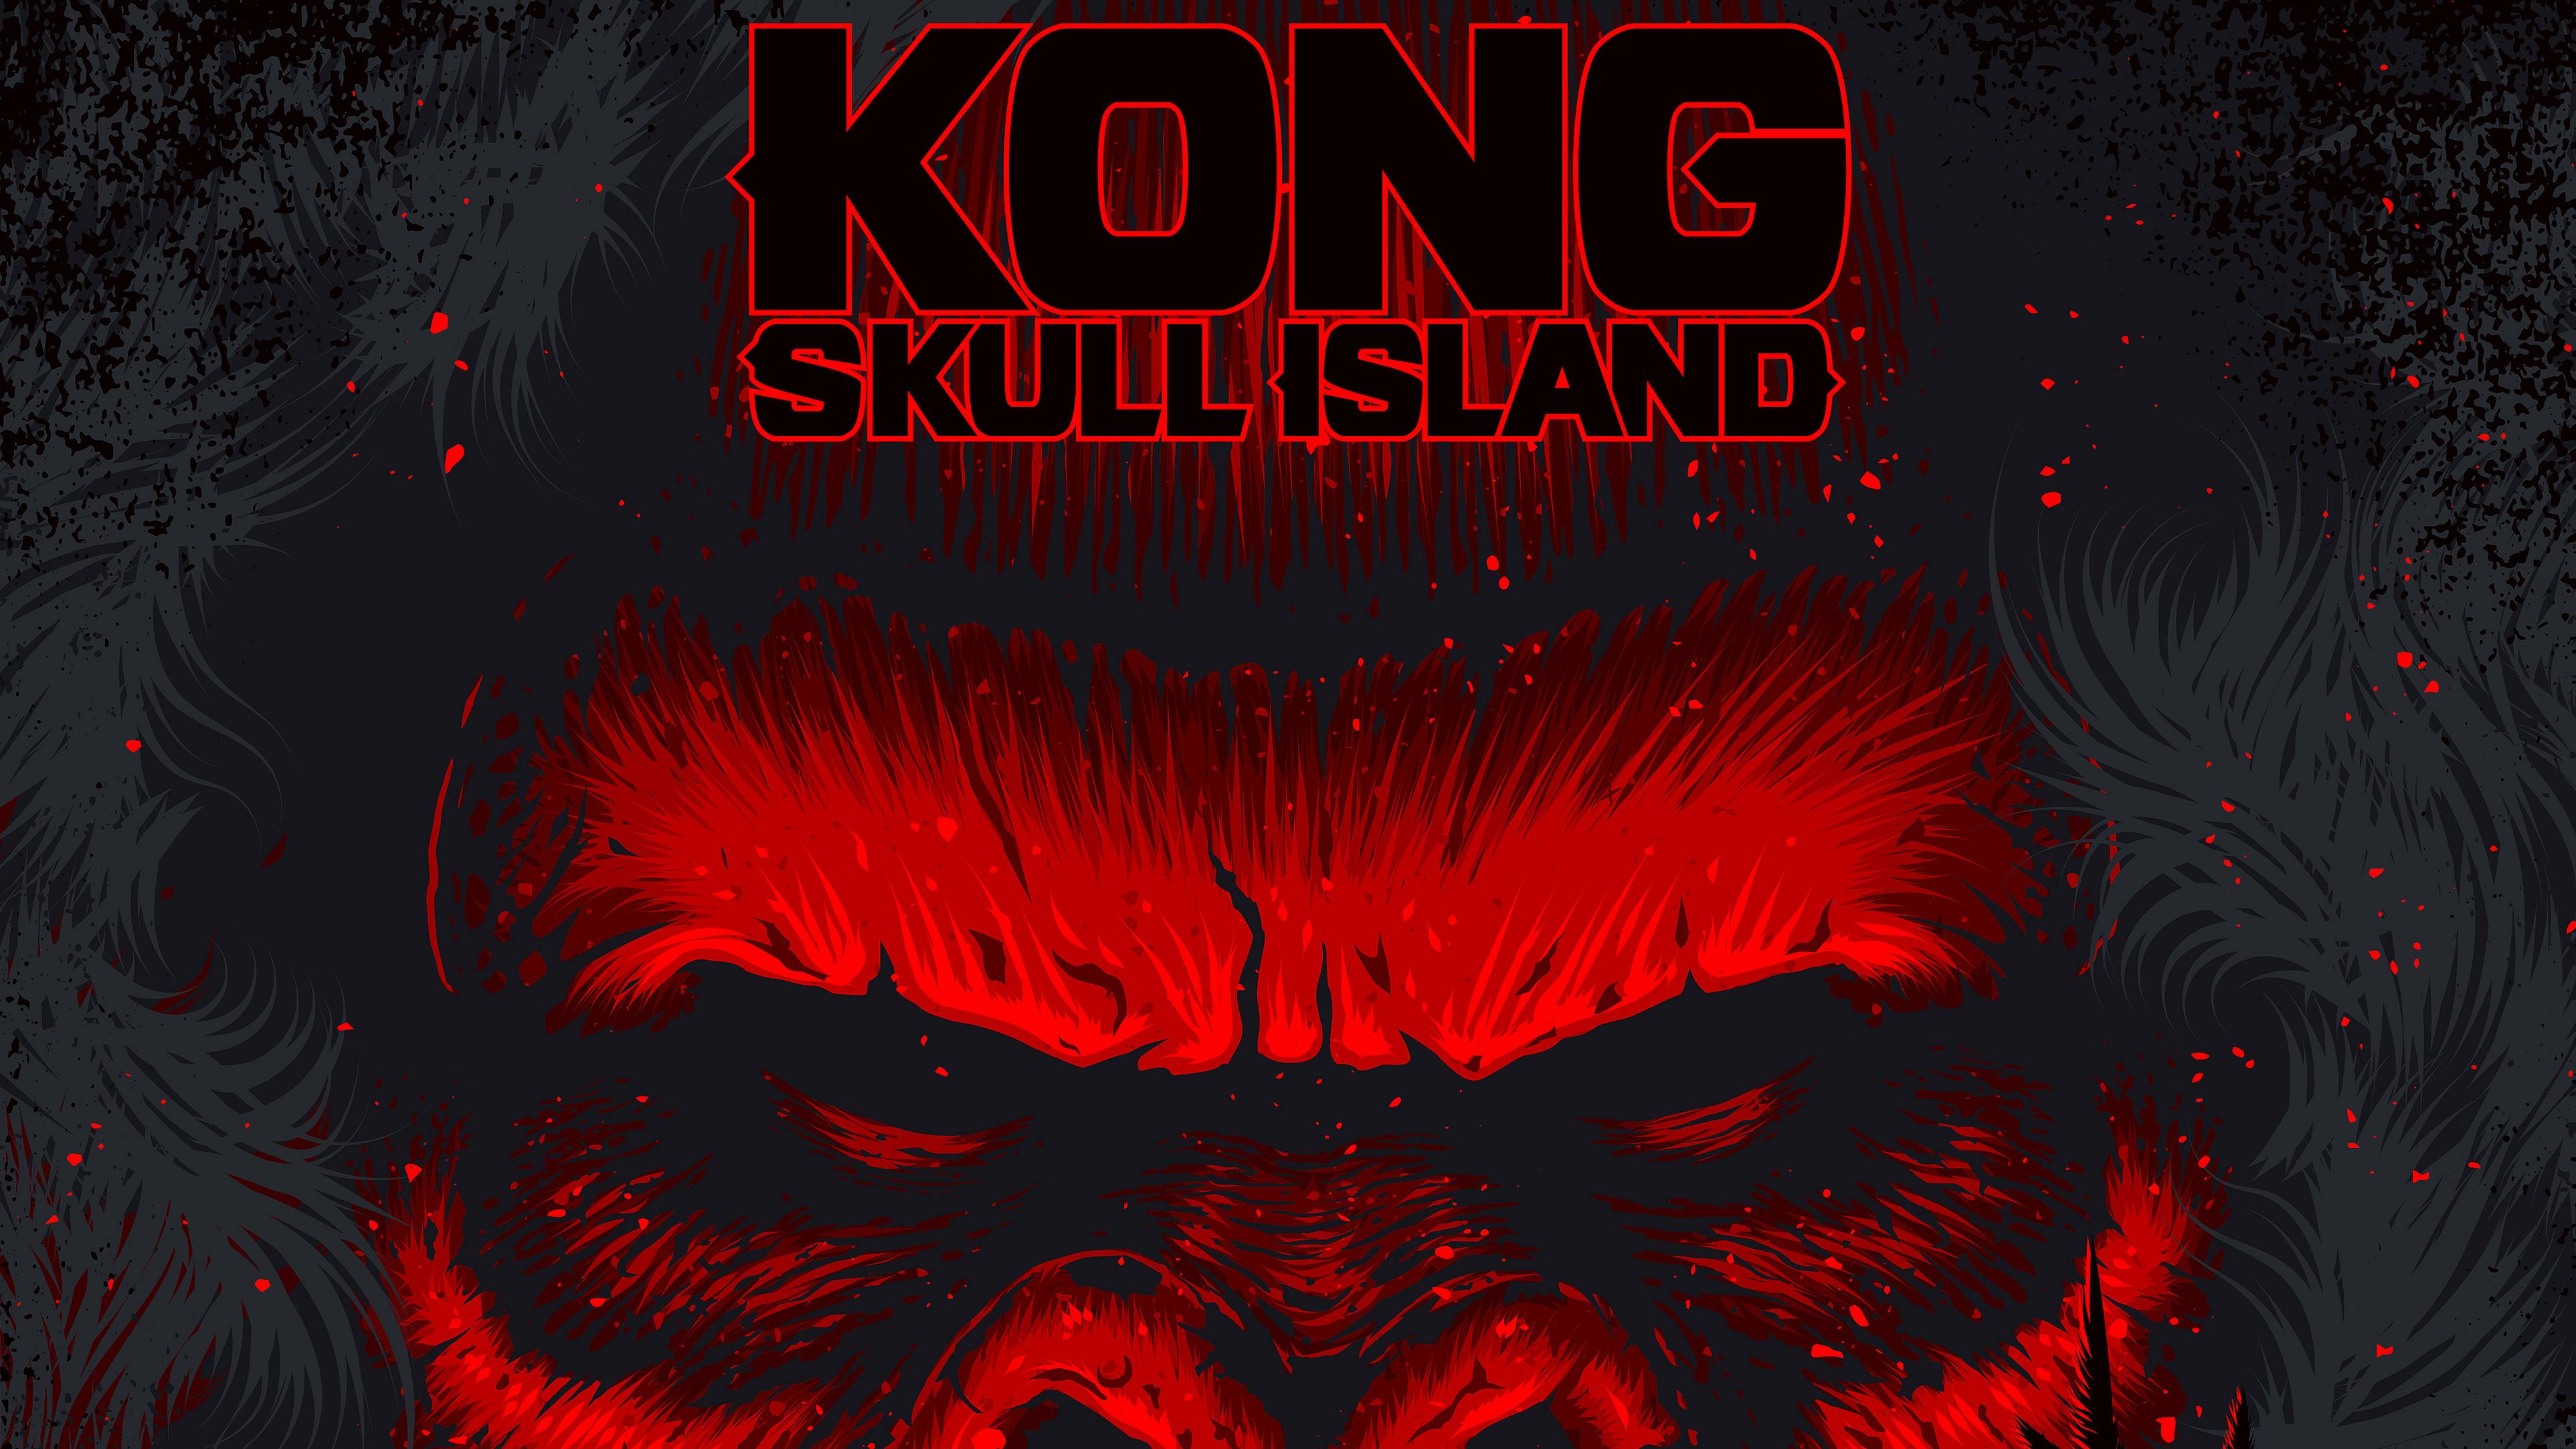 Movie Kong Skull Island 3850x2166